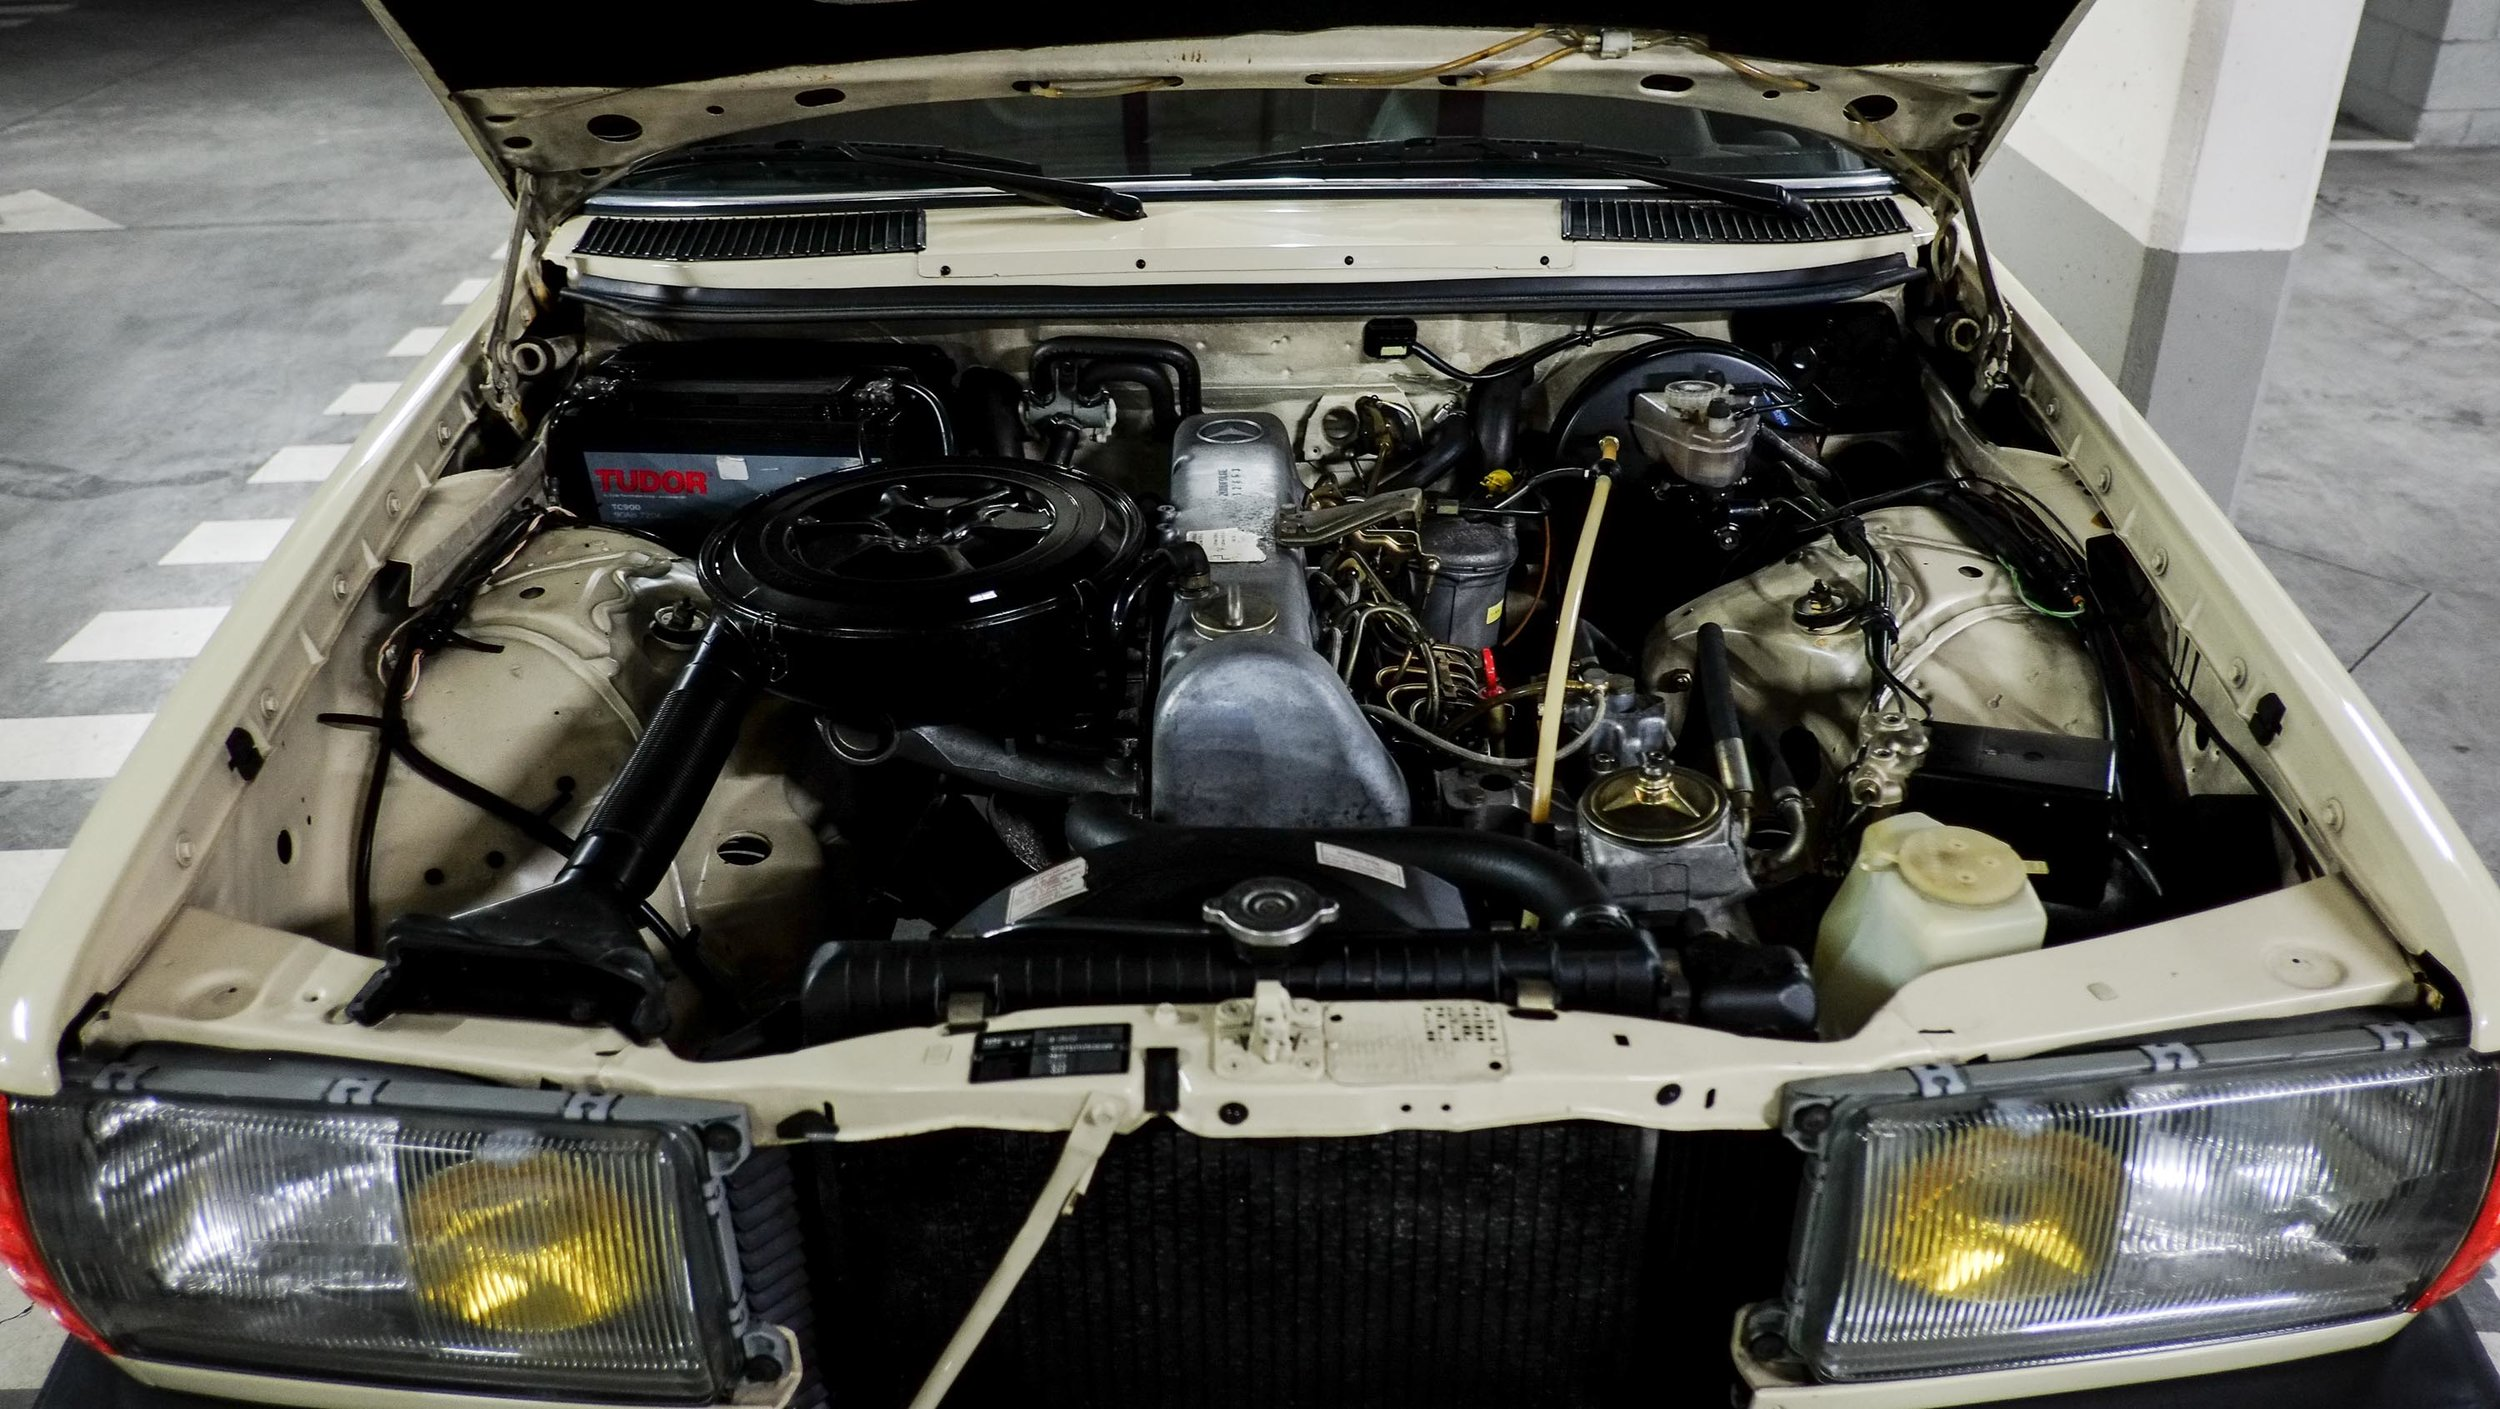 coolnvintage Mercedes-Benz W123 300D (13 of 59).jpg